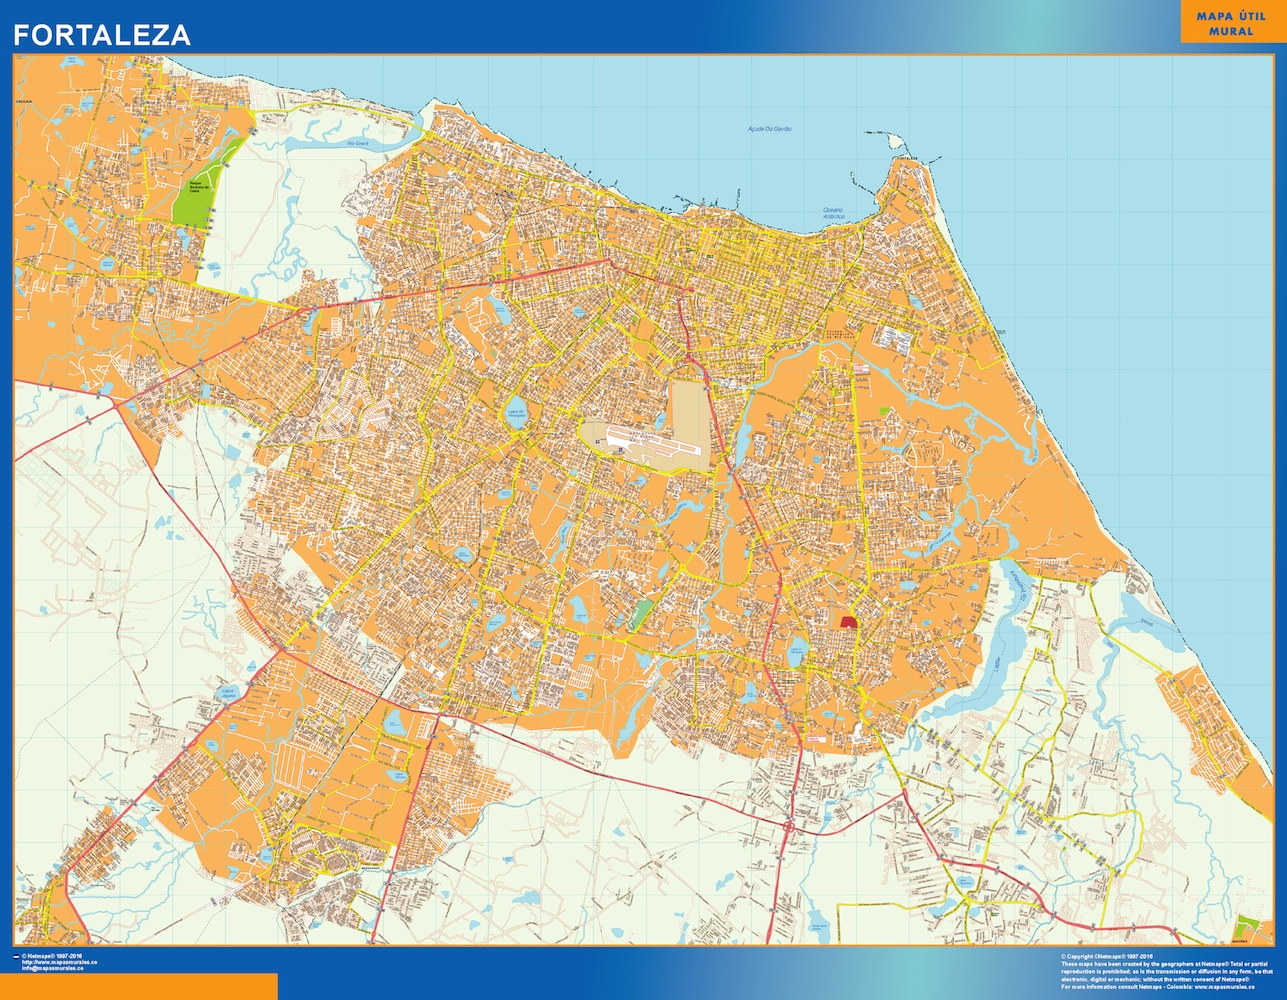 Mapa Fortaleza Brasil plastificado gigante